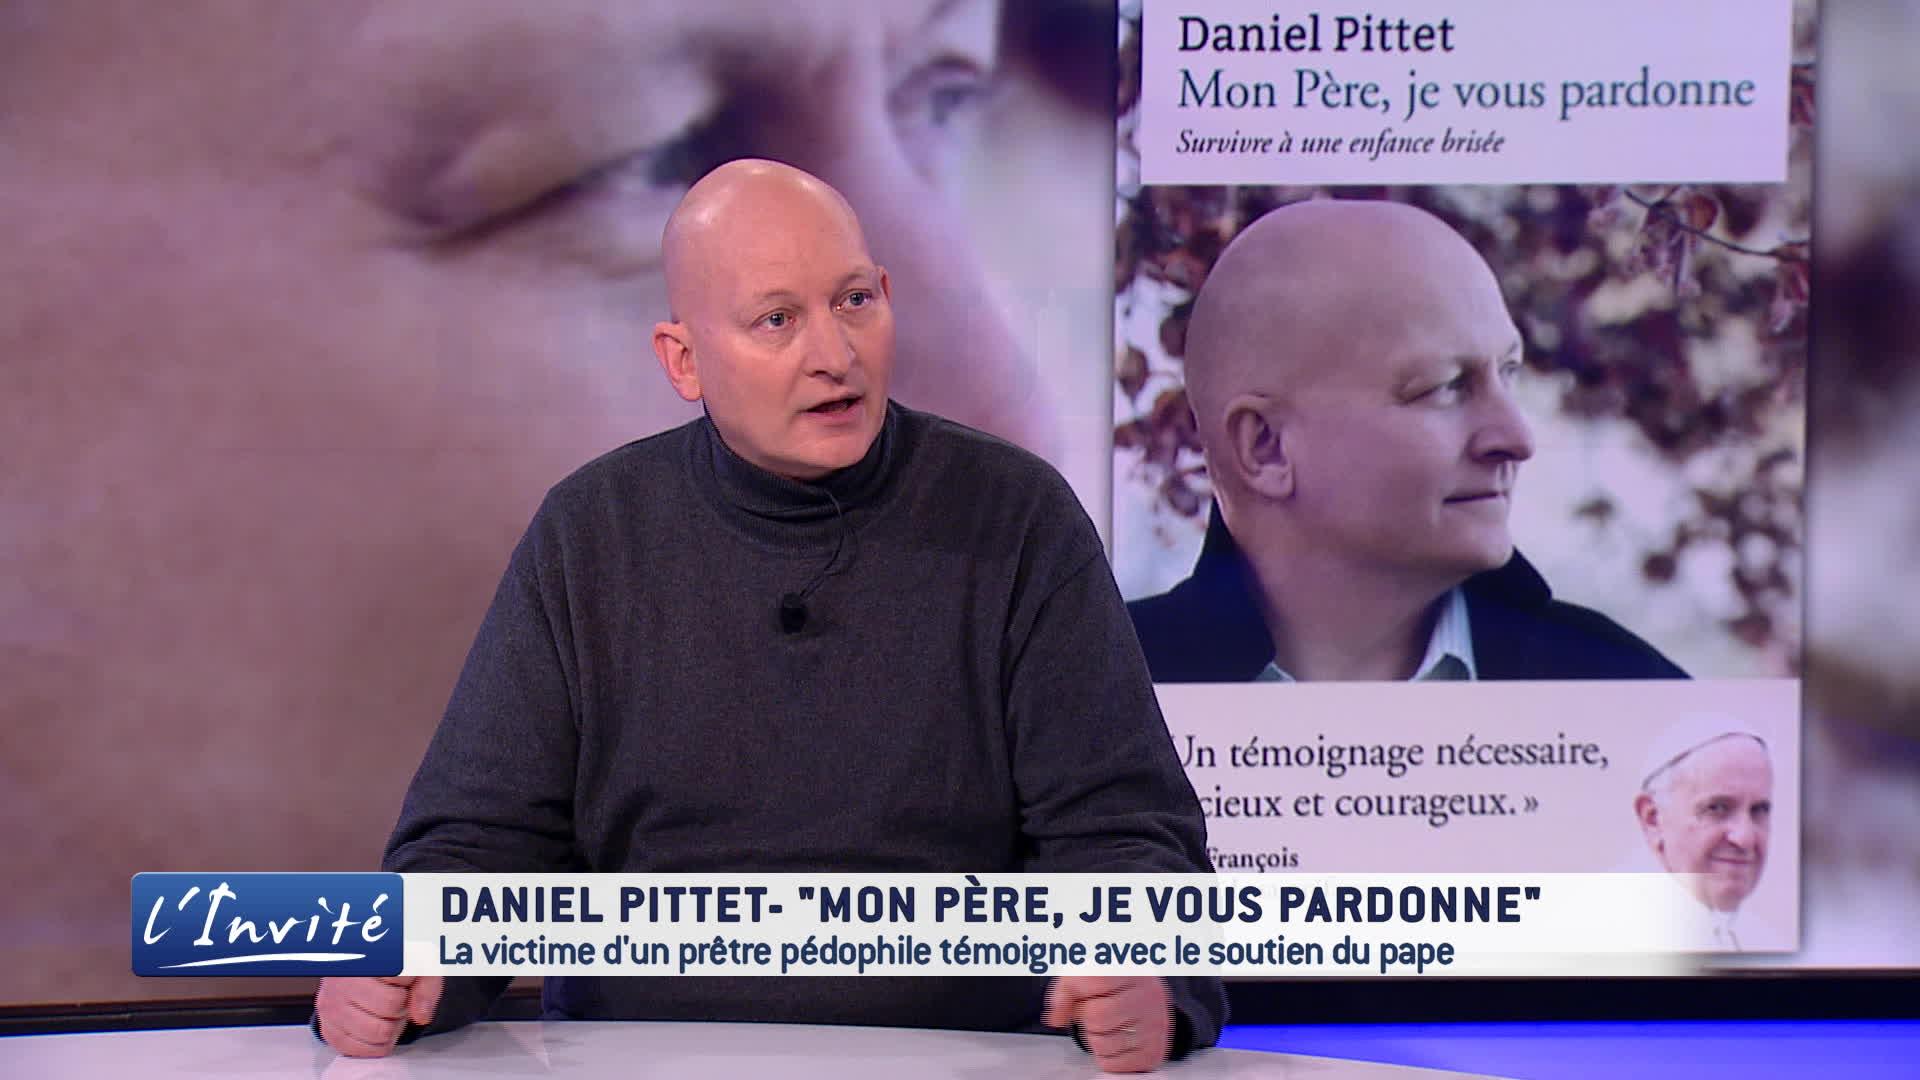 Daniel Pittet